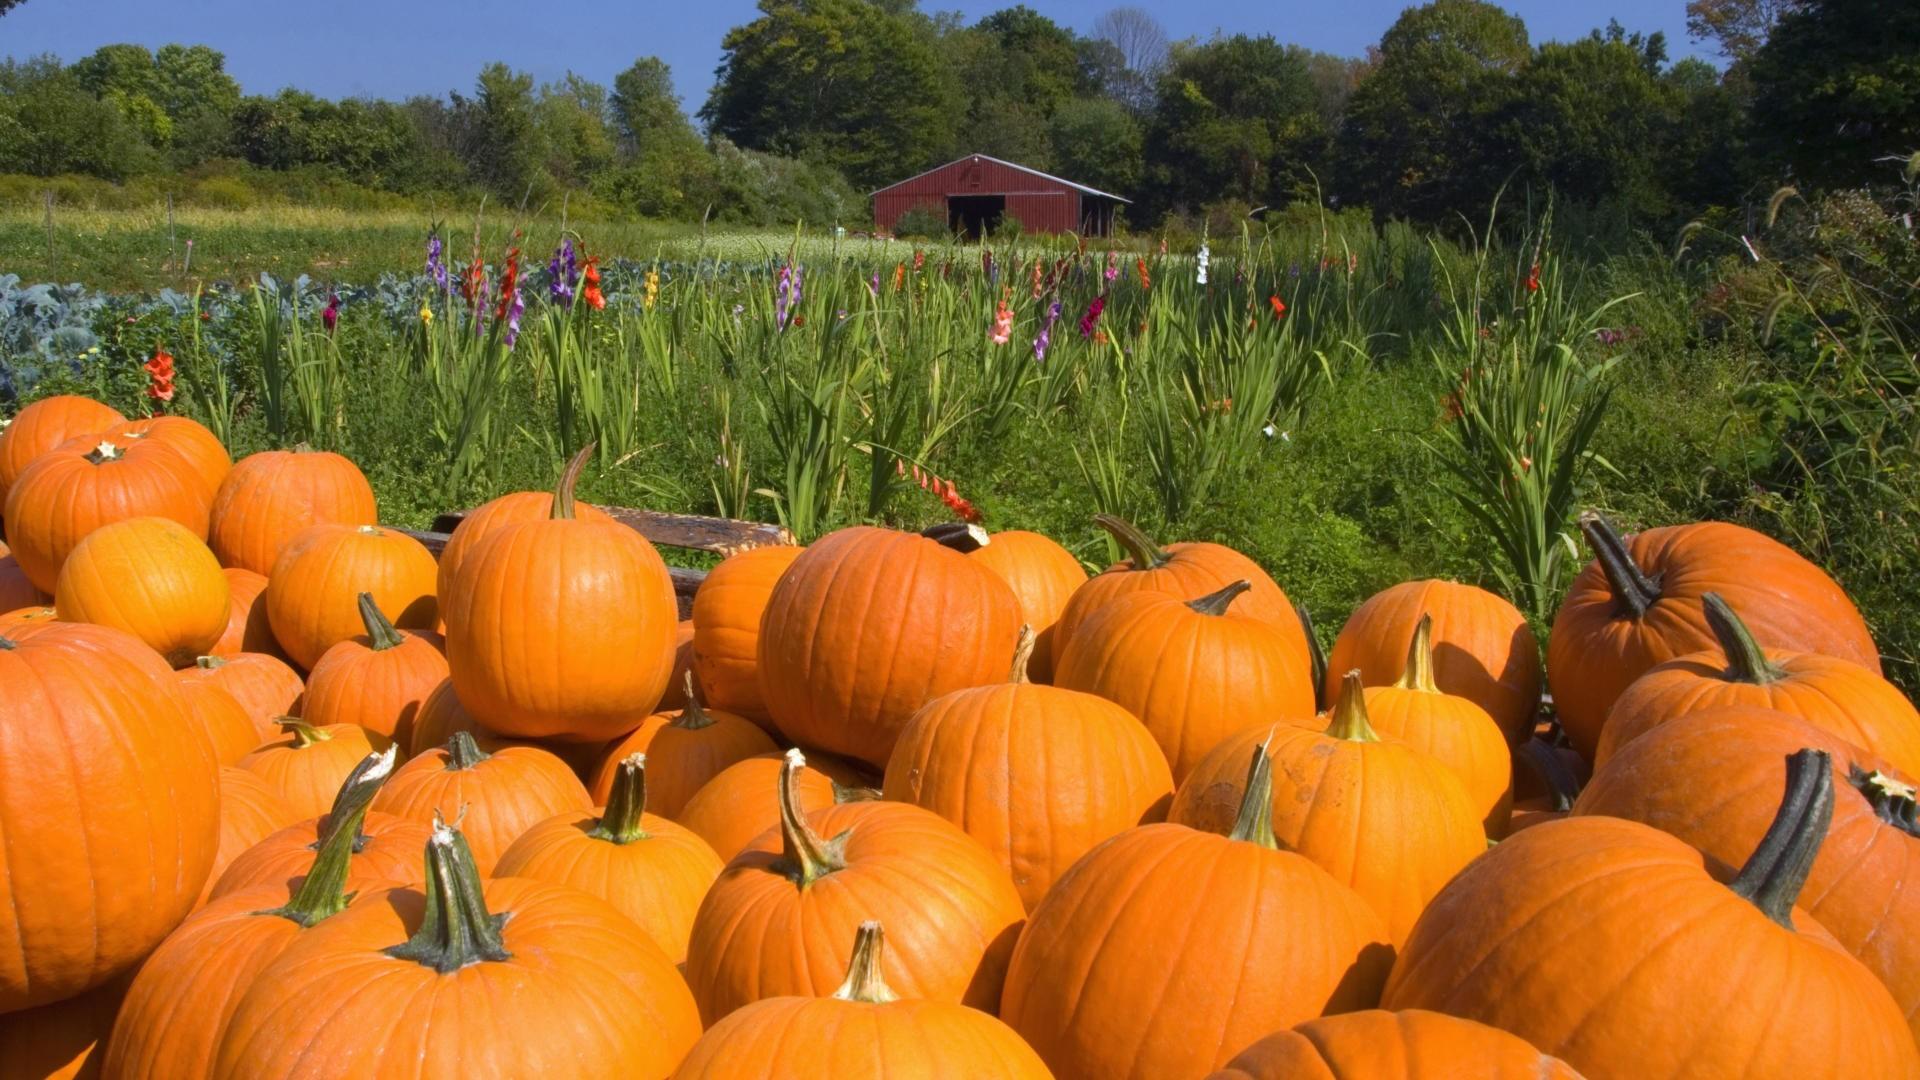 Fall Harvest wallpaper ·① Download free amazing HD ...